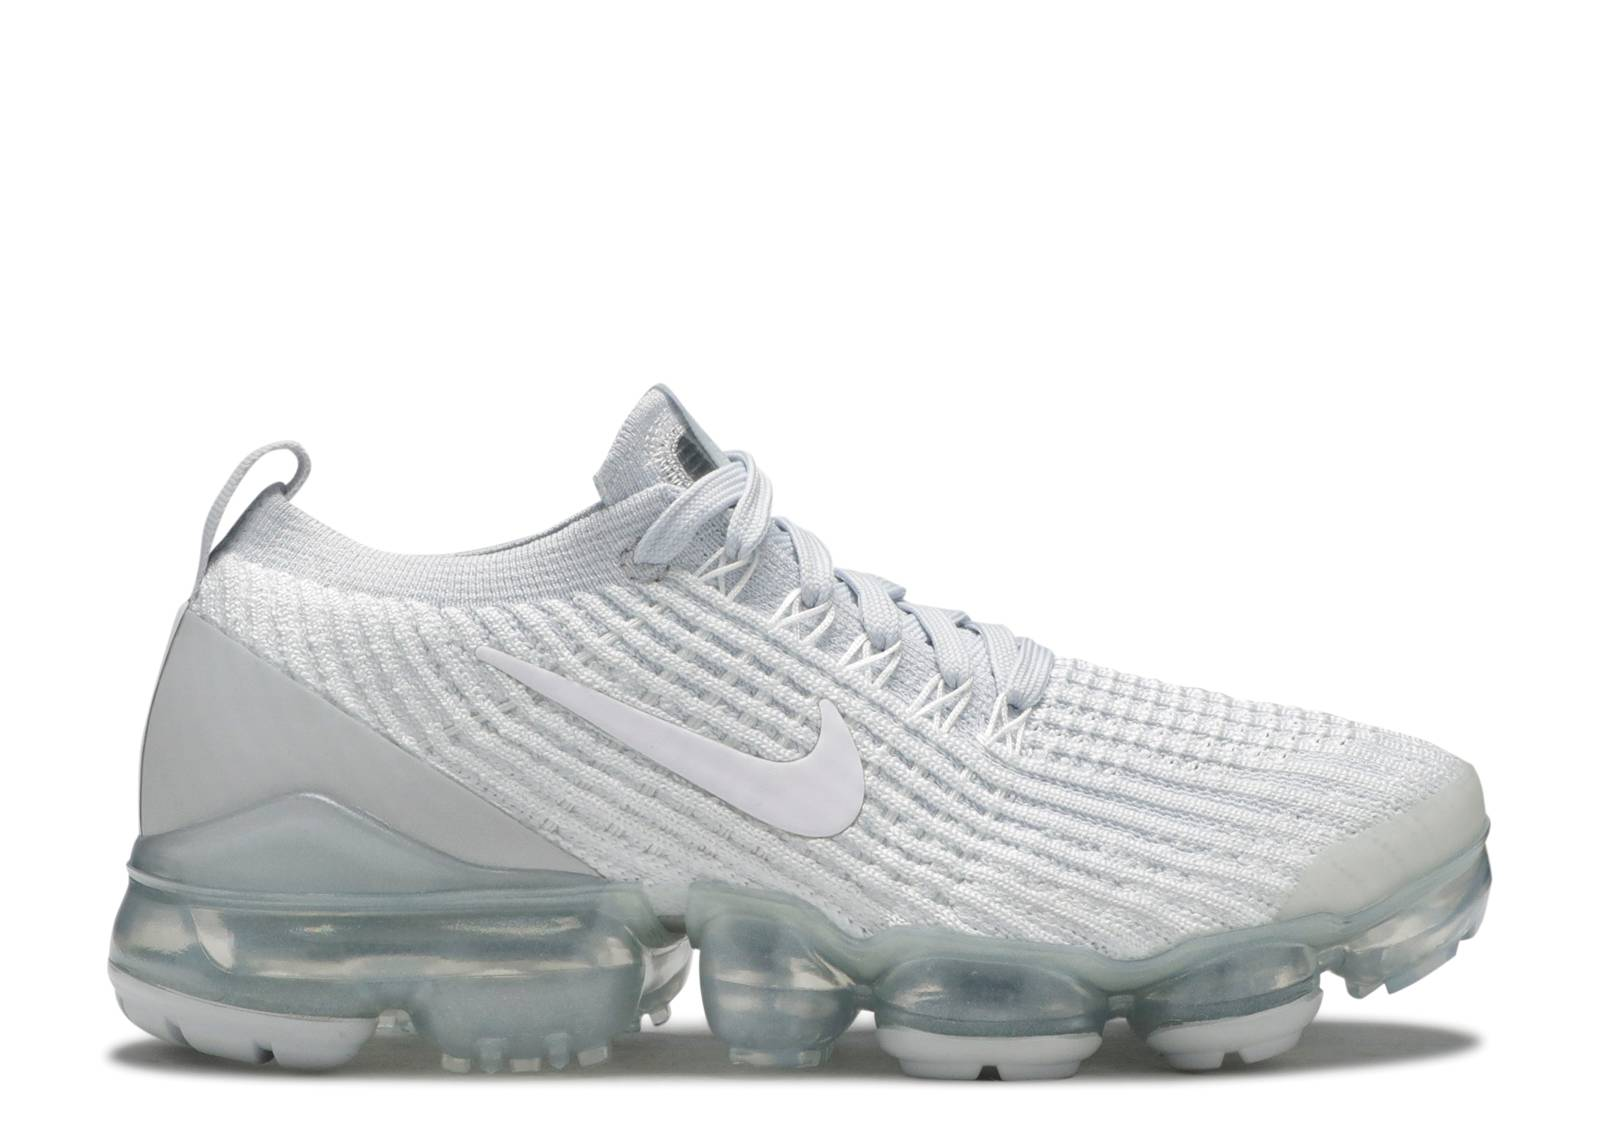 nike air vapormax flyknit 3 white/pure platinum women's shoe